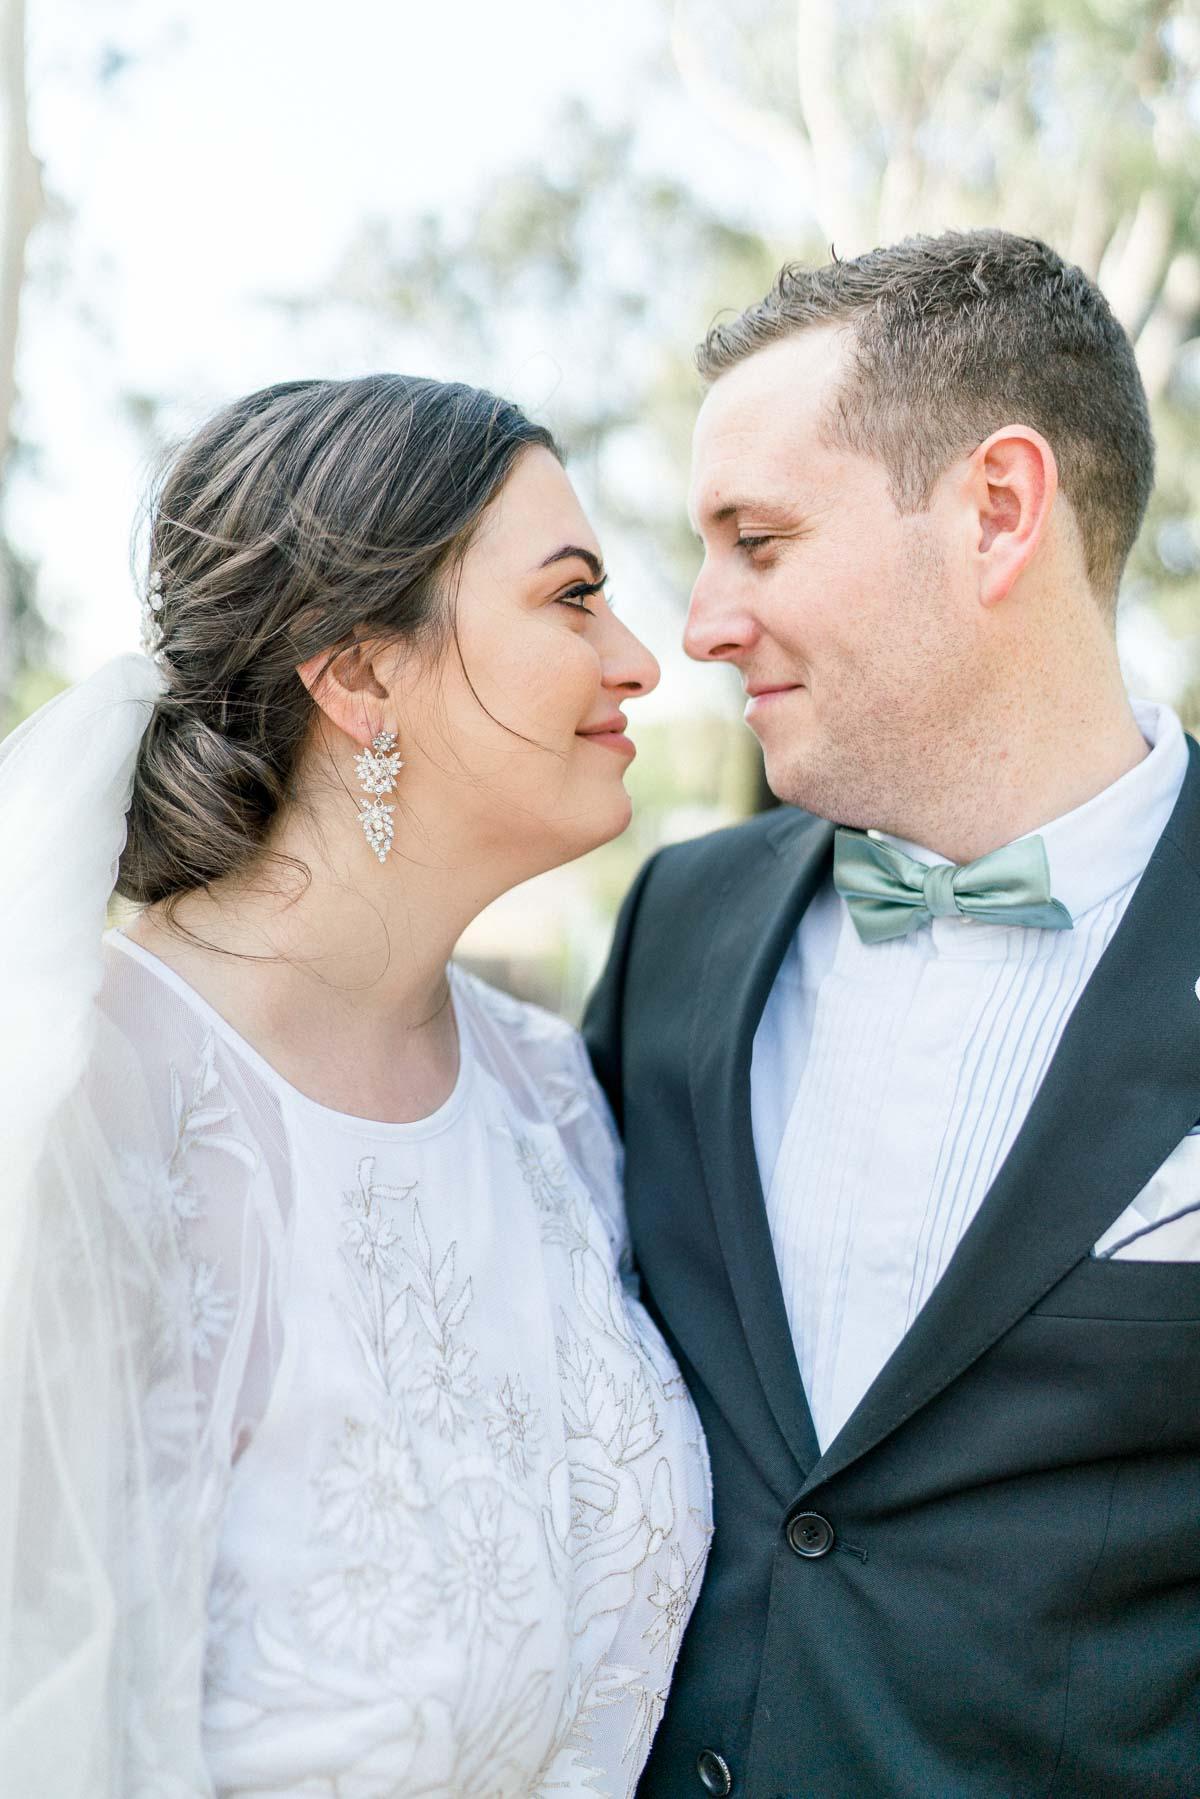 little-henri-cafe-wedding-thornbury-heart+soul-weddings-jane-aaron-05374.jpg